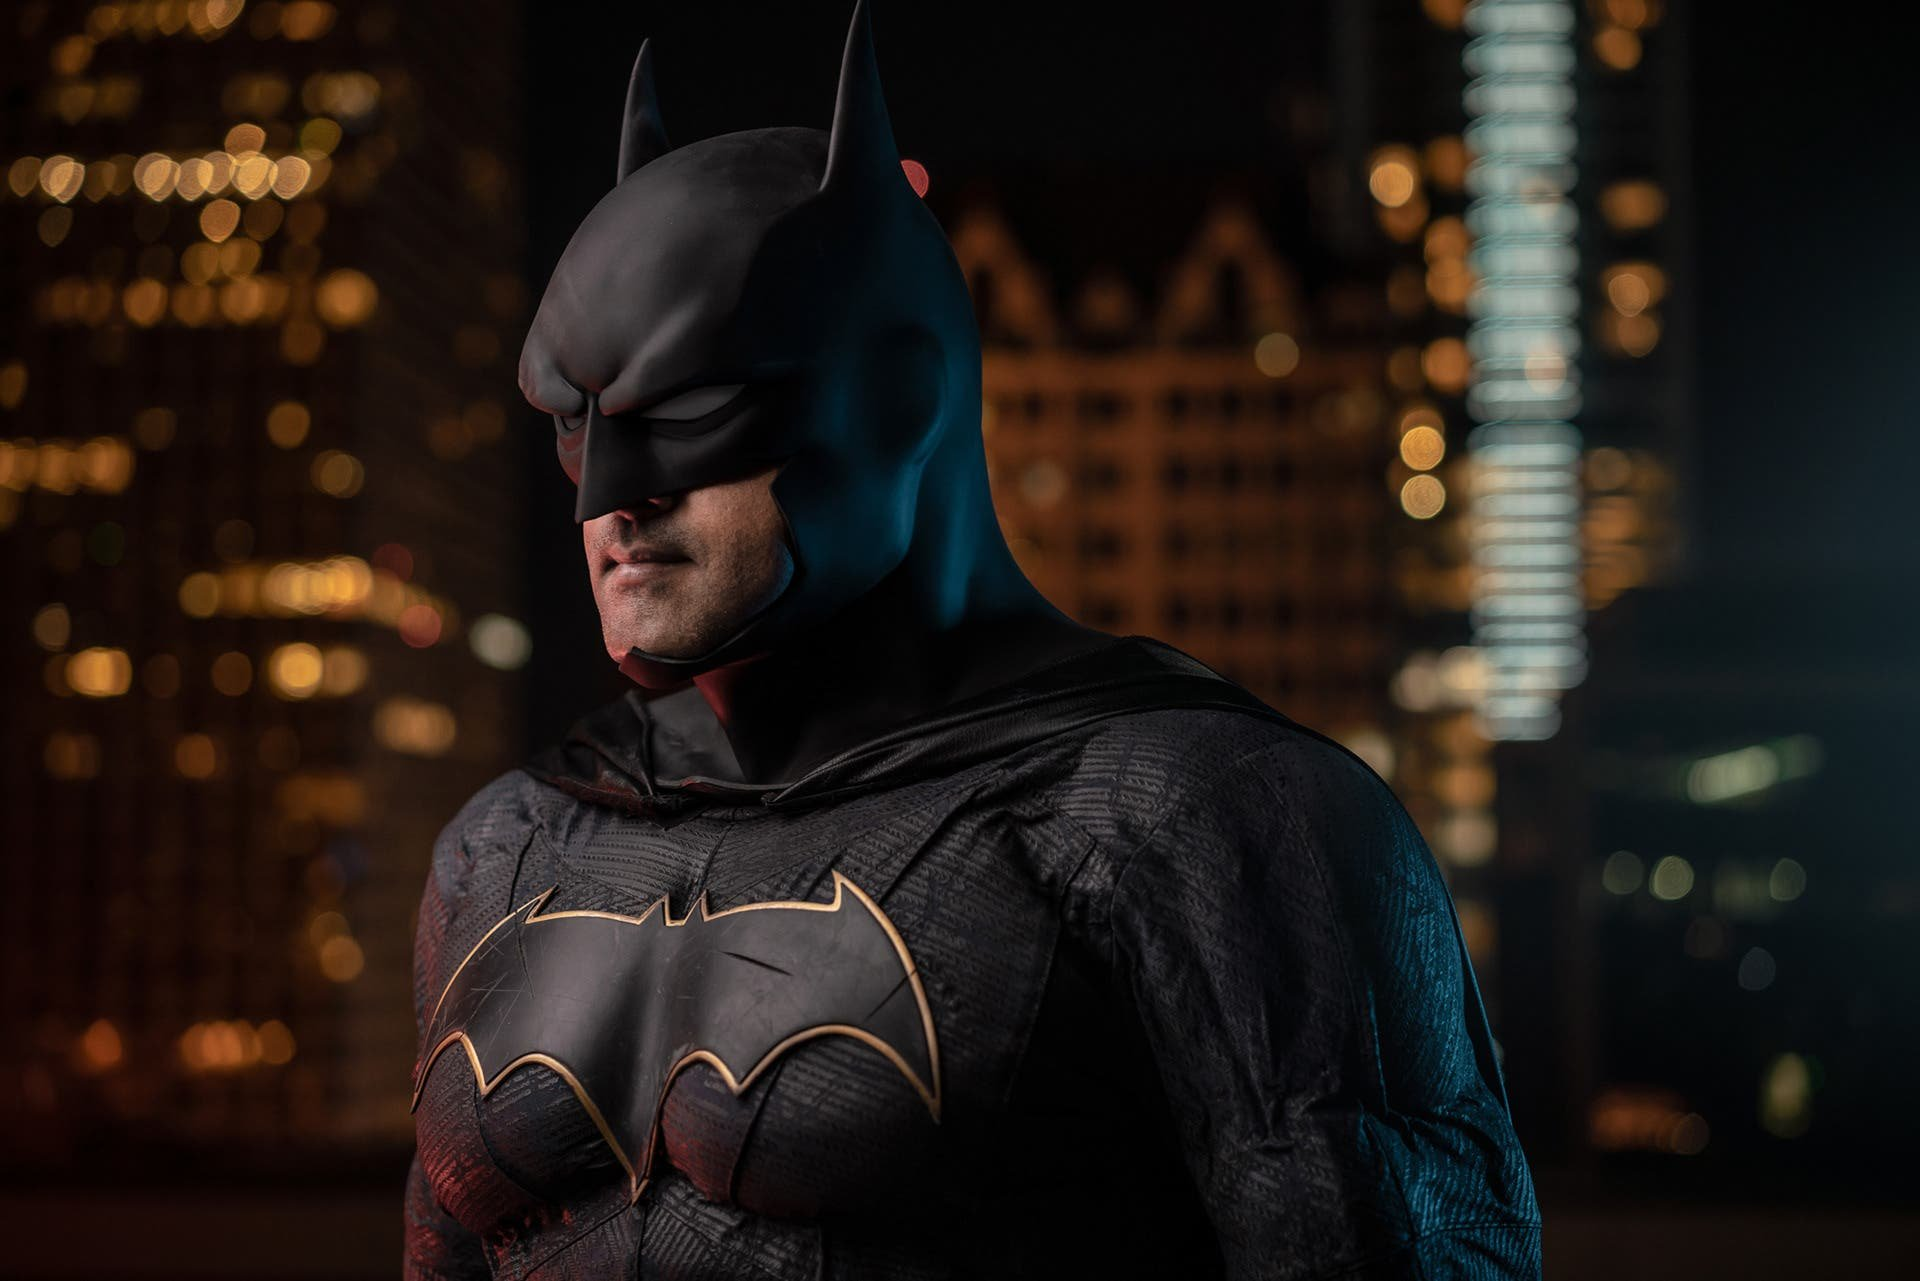 Ilya Nodia Creates a Cinematic Batman Cosplay Shoot With Video Lights